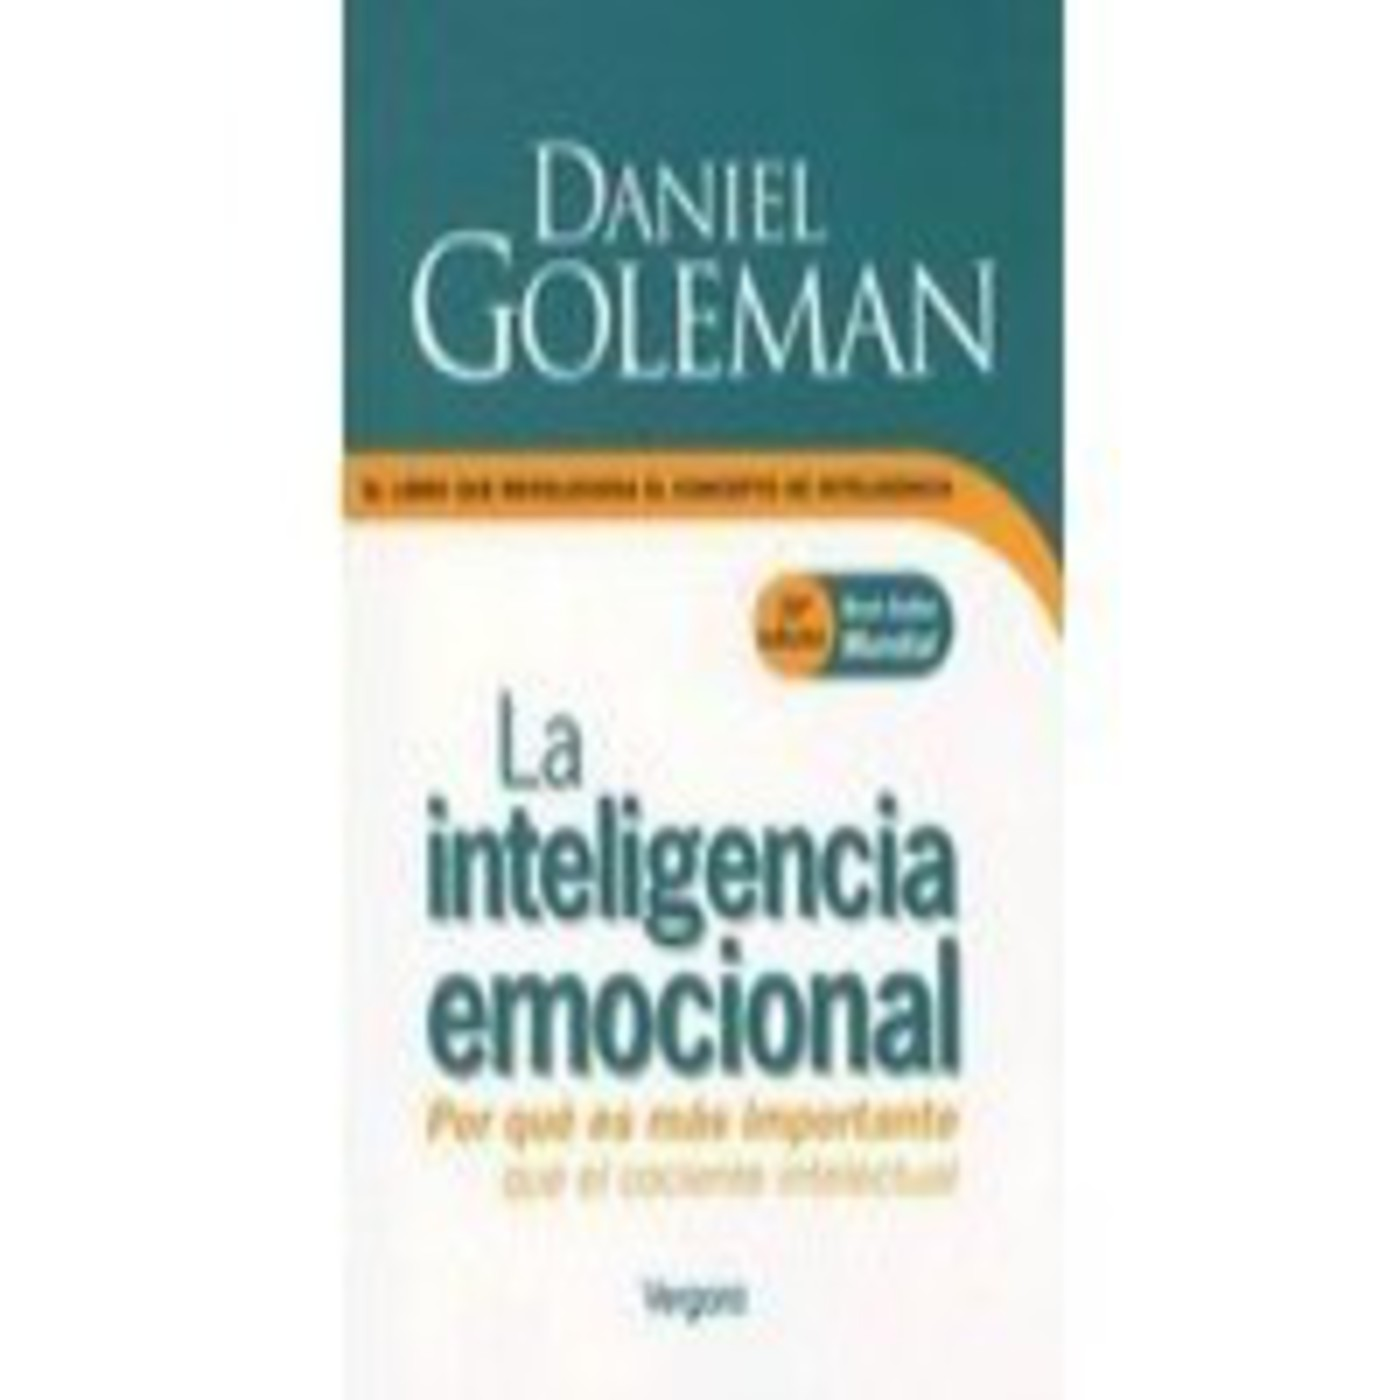 47..INTELIGENCIA EMOCIONAL, Daniel Goleman